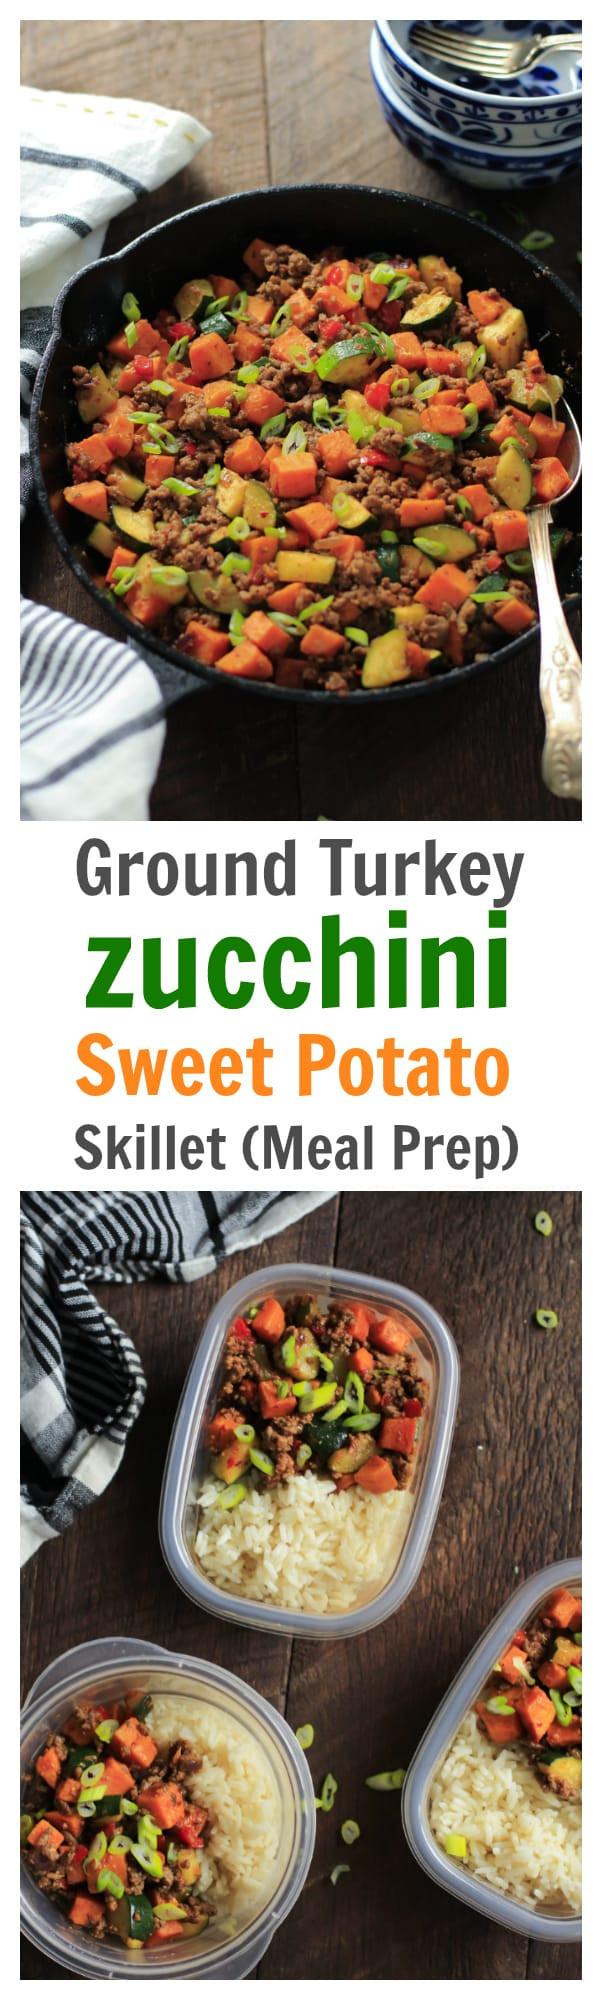 Ground Turkey Meal Prep  paleo ground beef sweet potato casserole